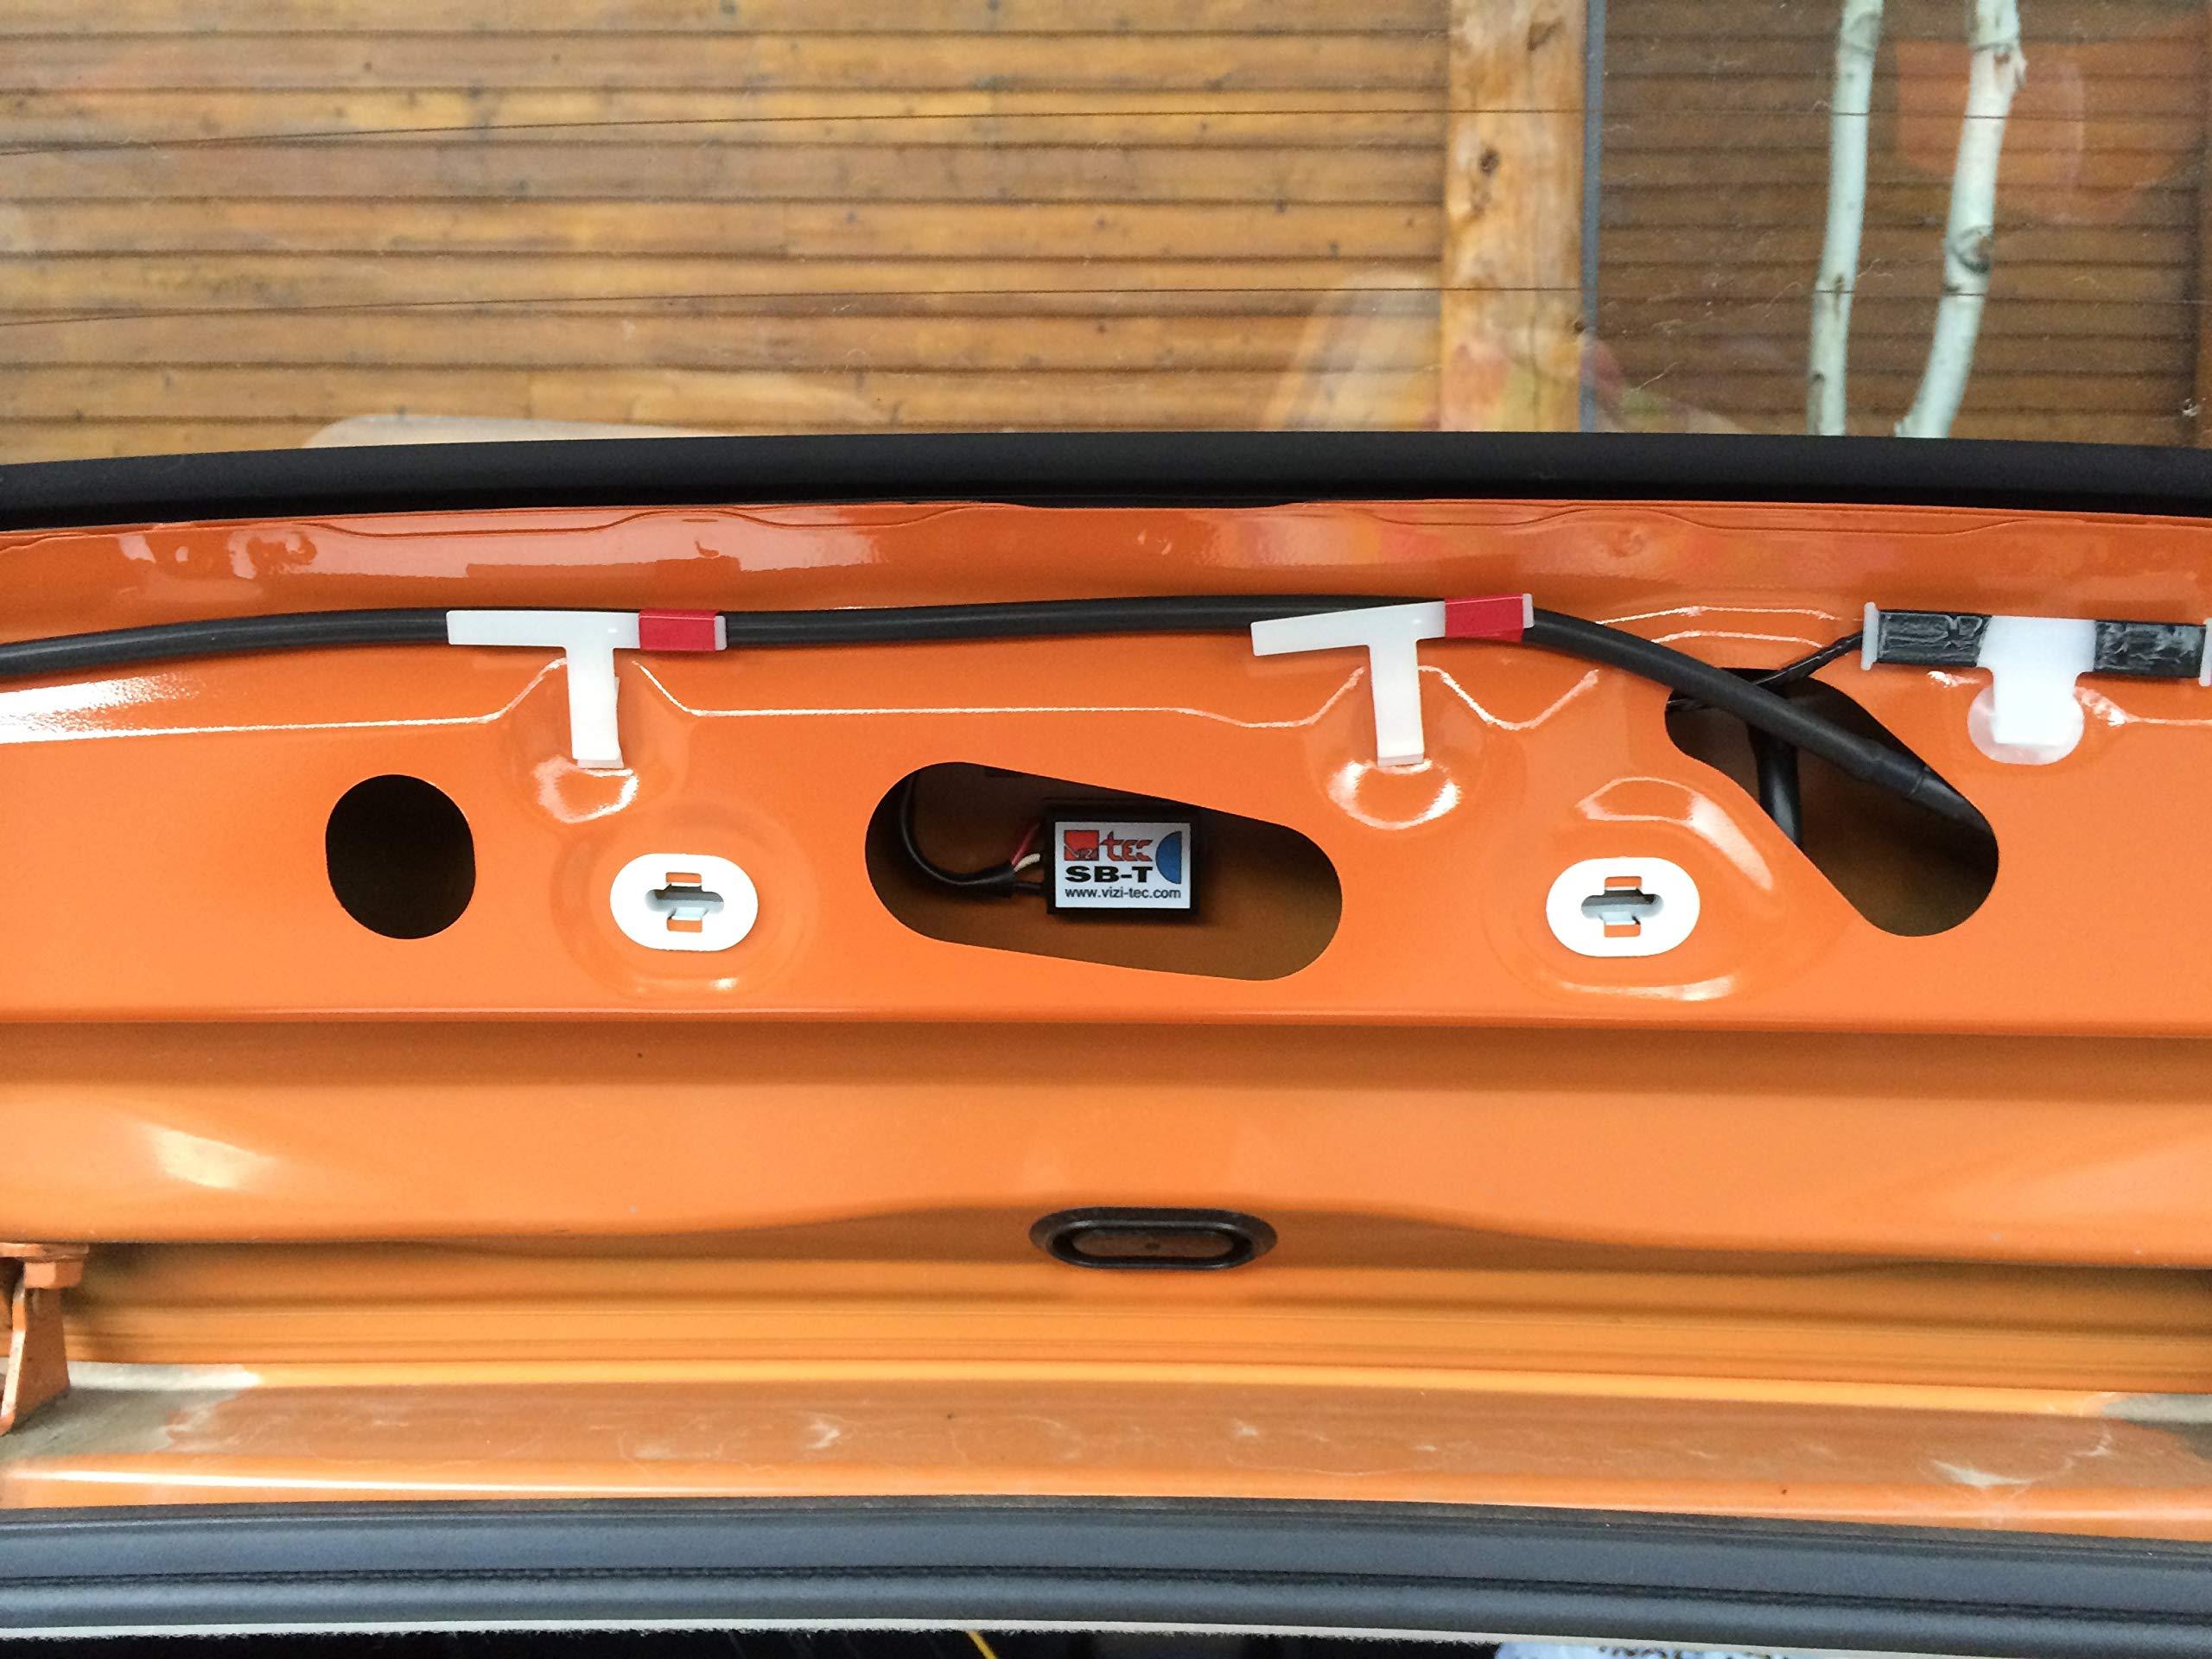 Third Brake Light Modulator for cars and trucks- Vizi-tec SupaBrake SBT-4K by Vizi-Tec (Image #3)